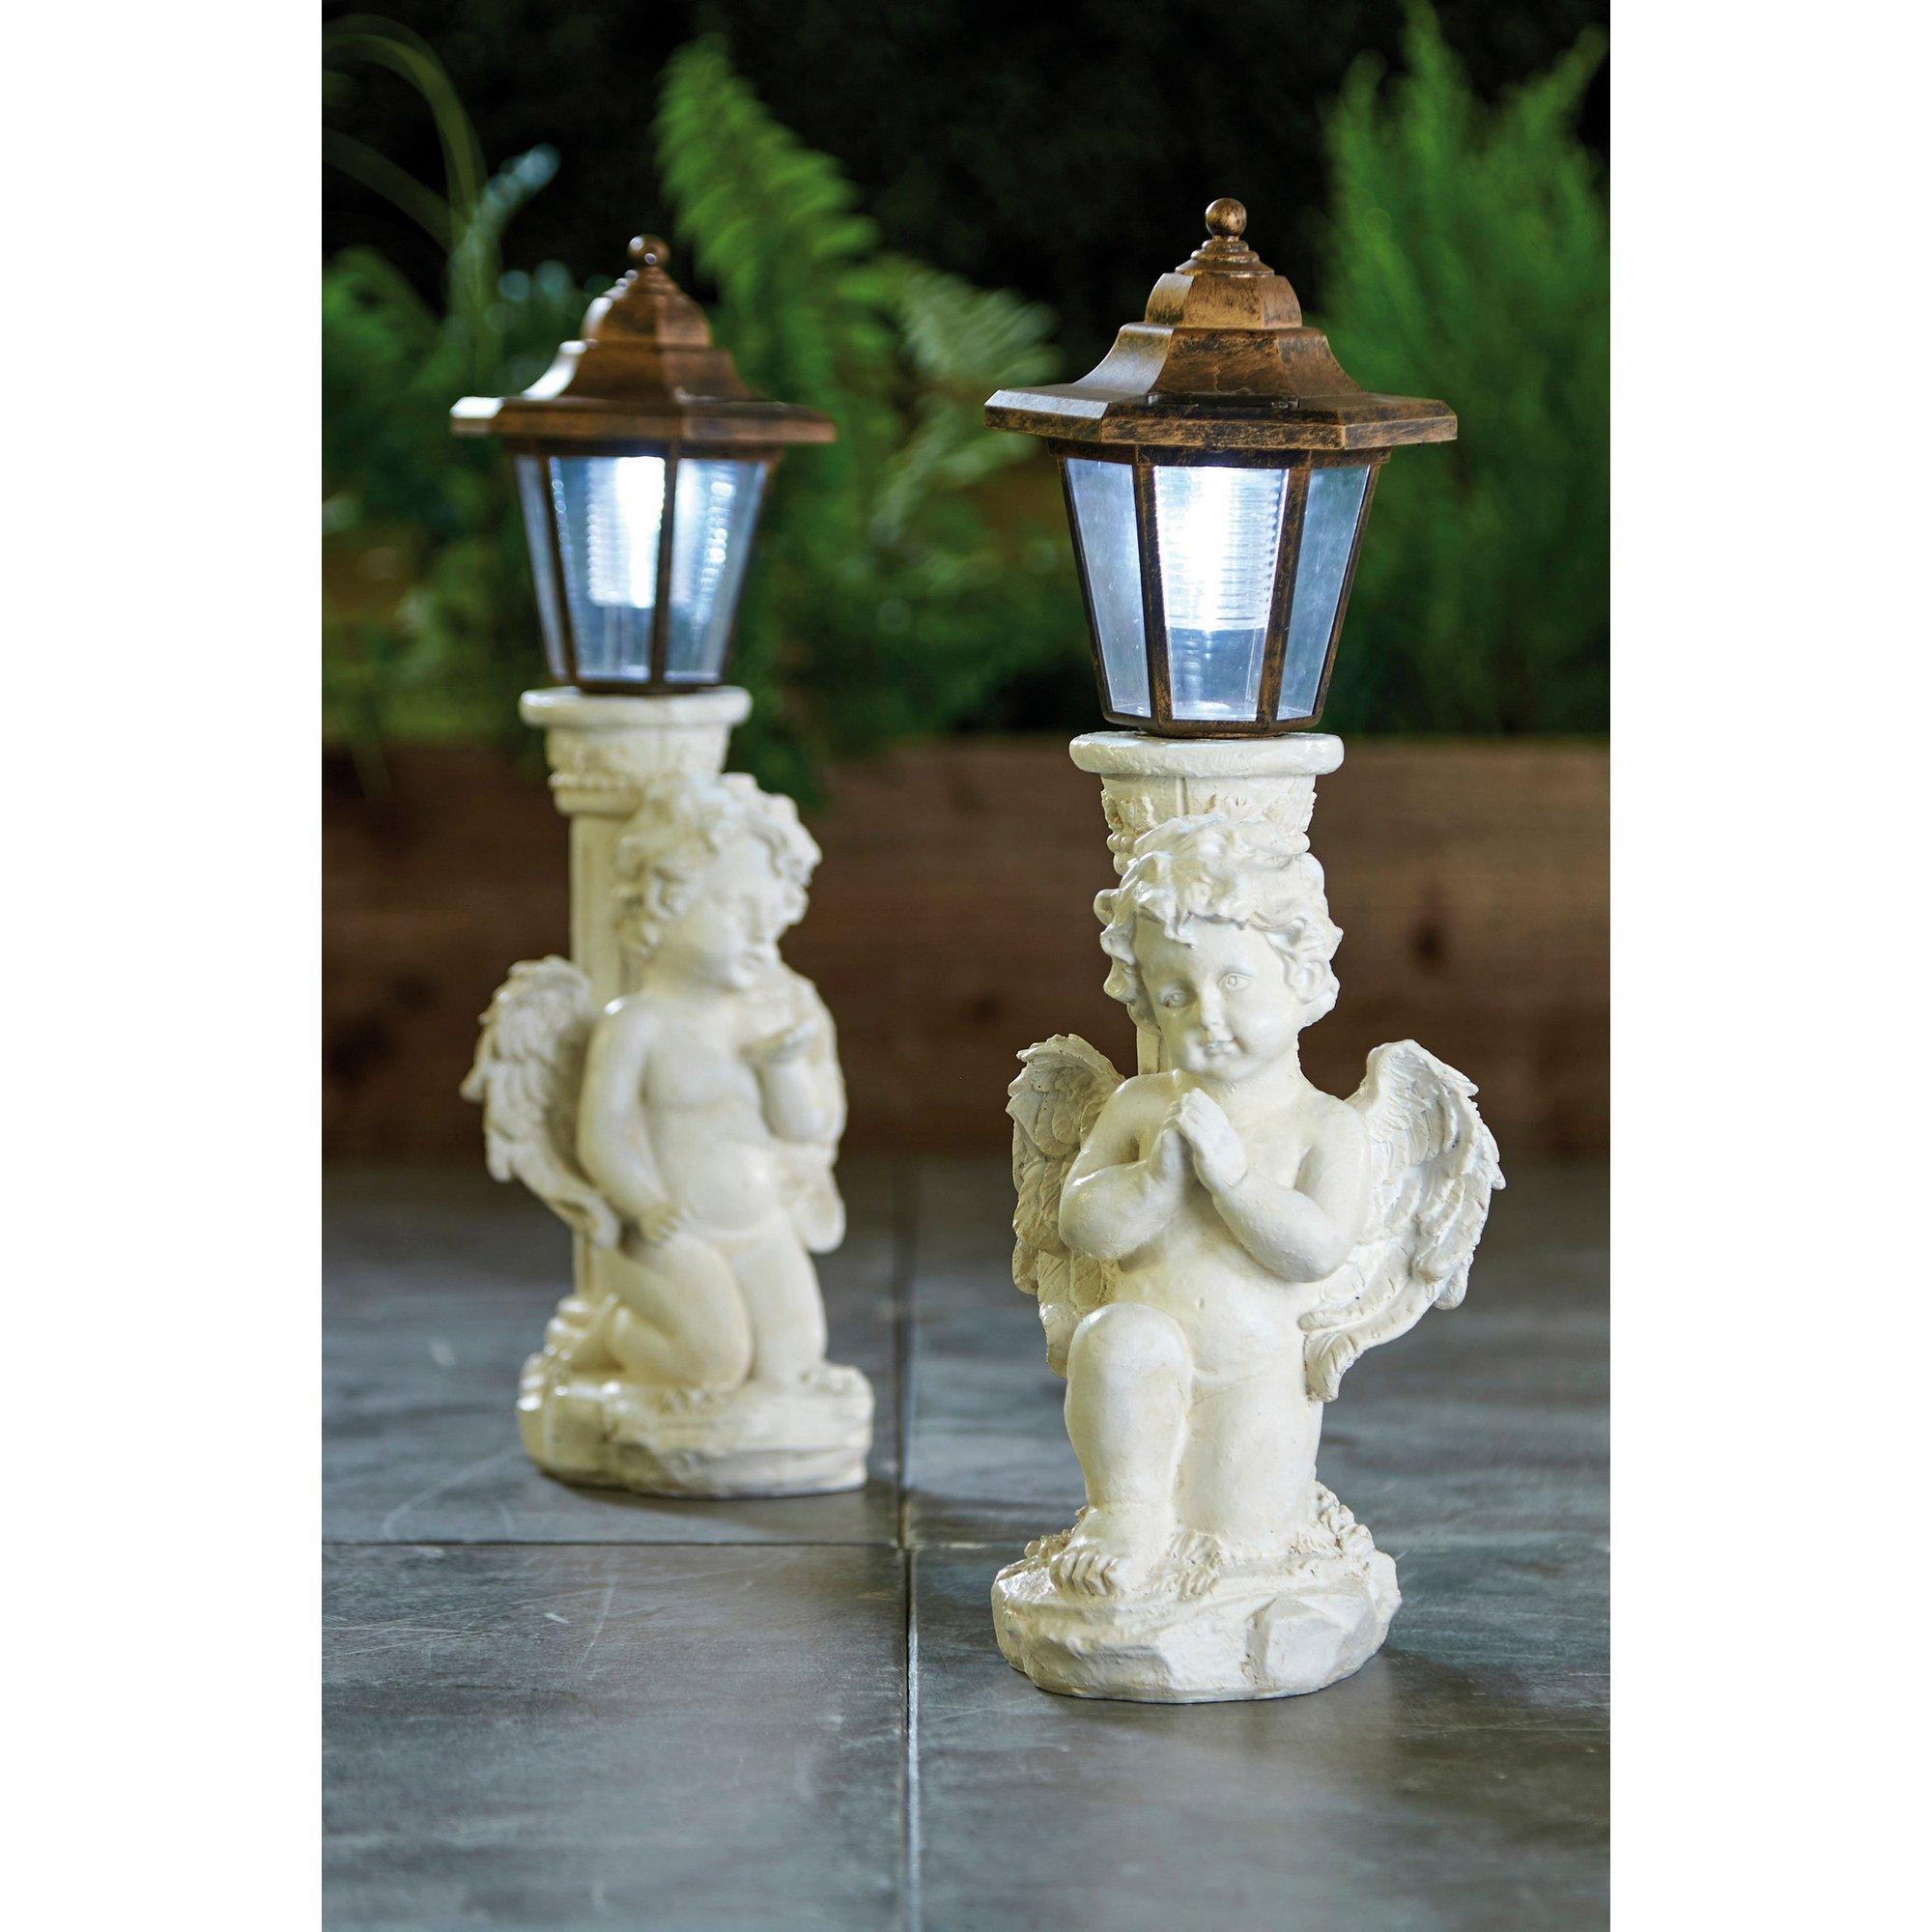 Image of Pair of Solar Angel Lanterns